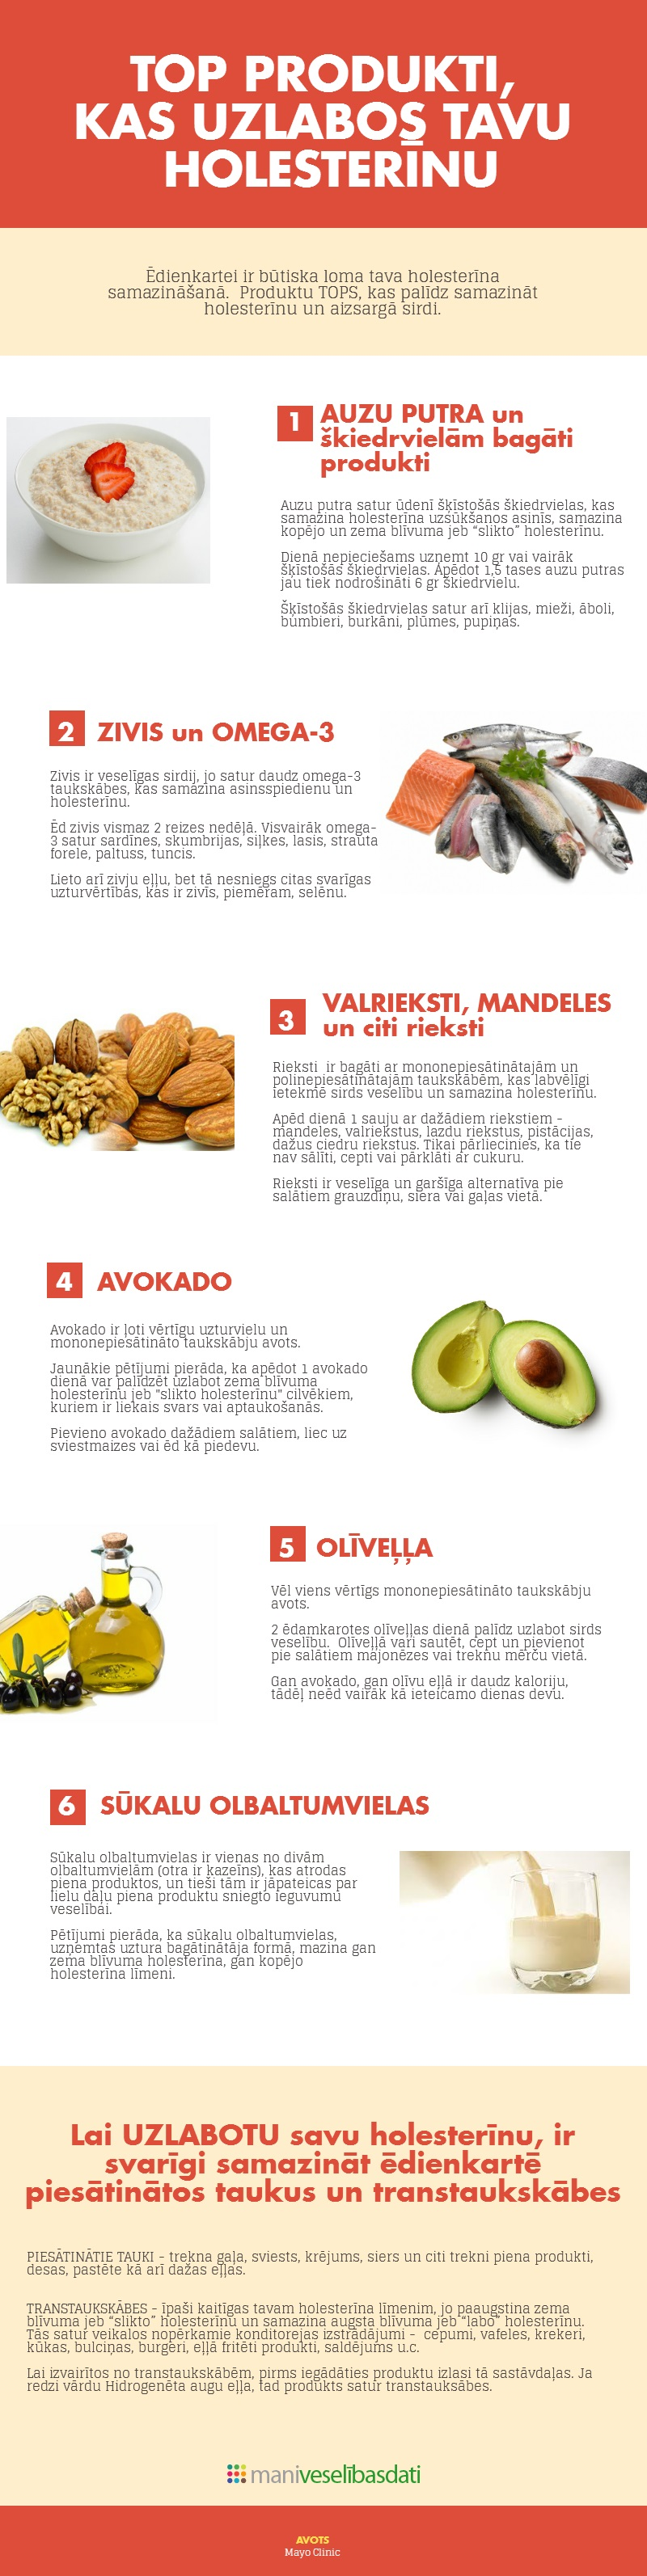 Produkti, kas uzlabo holesterīnu